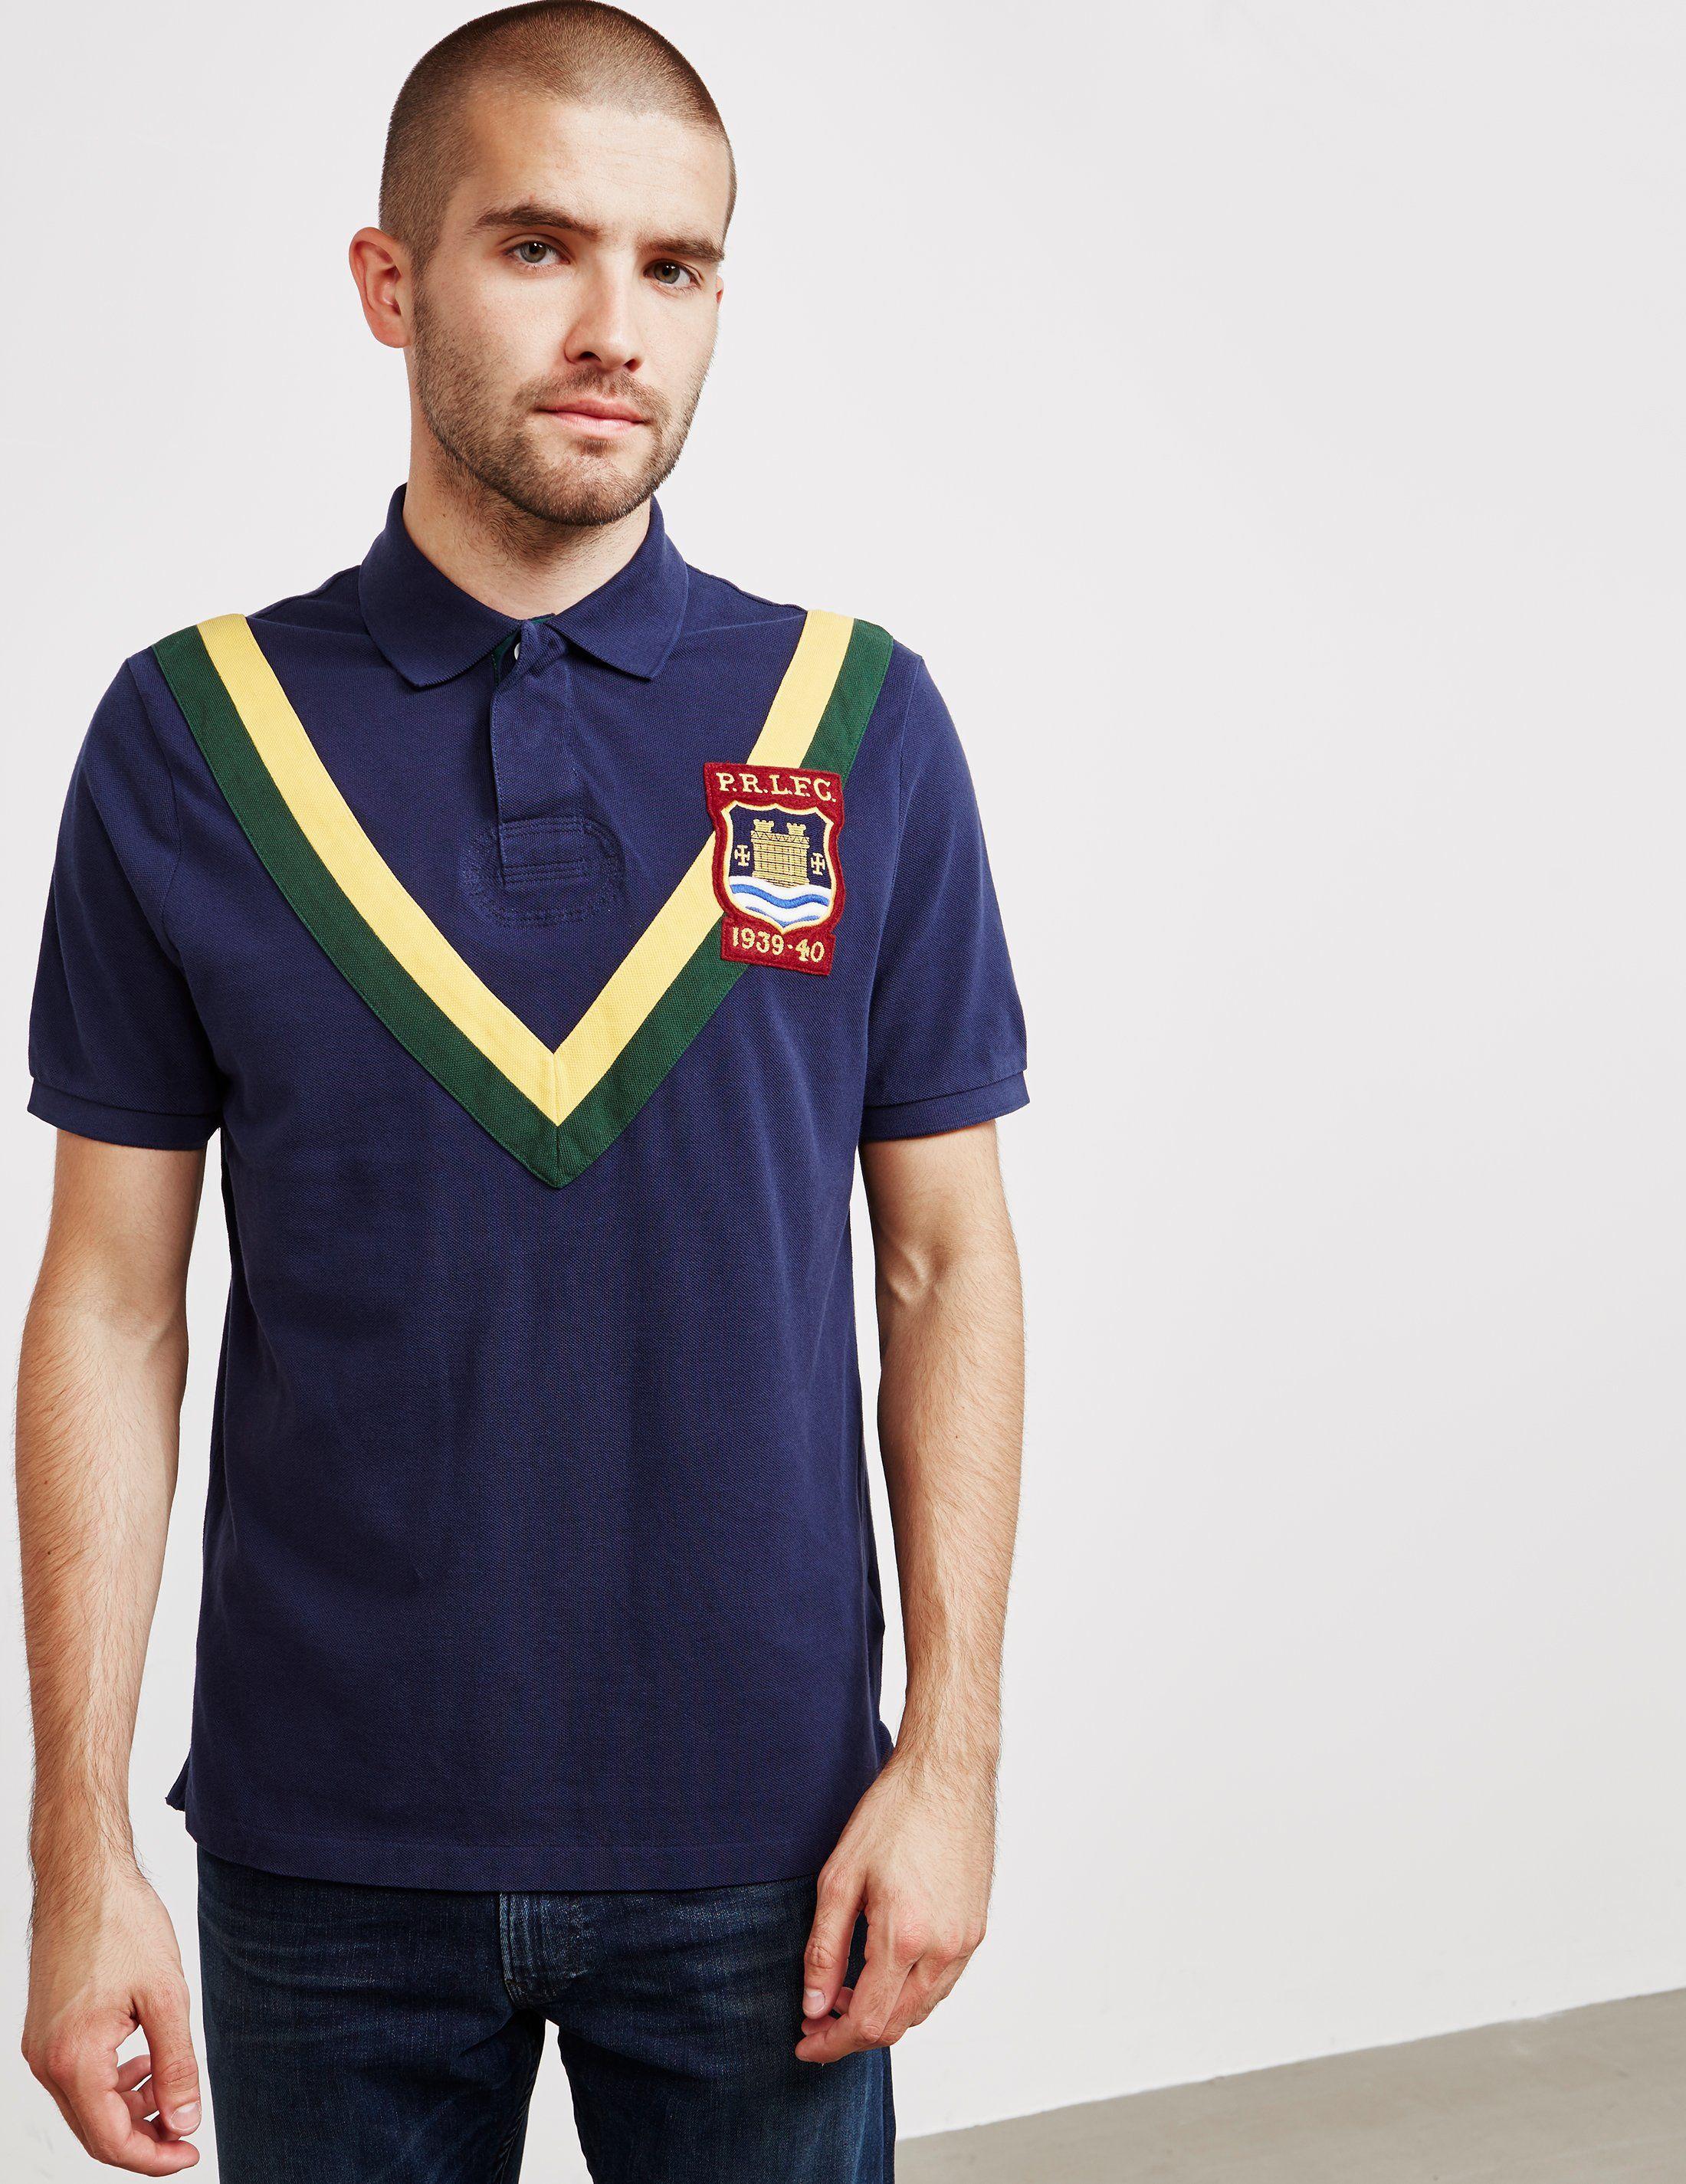 Polo Ralph Lauren Badge Short Sleeve Polo Shirt